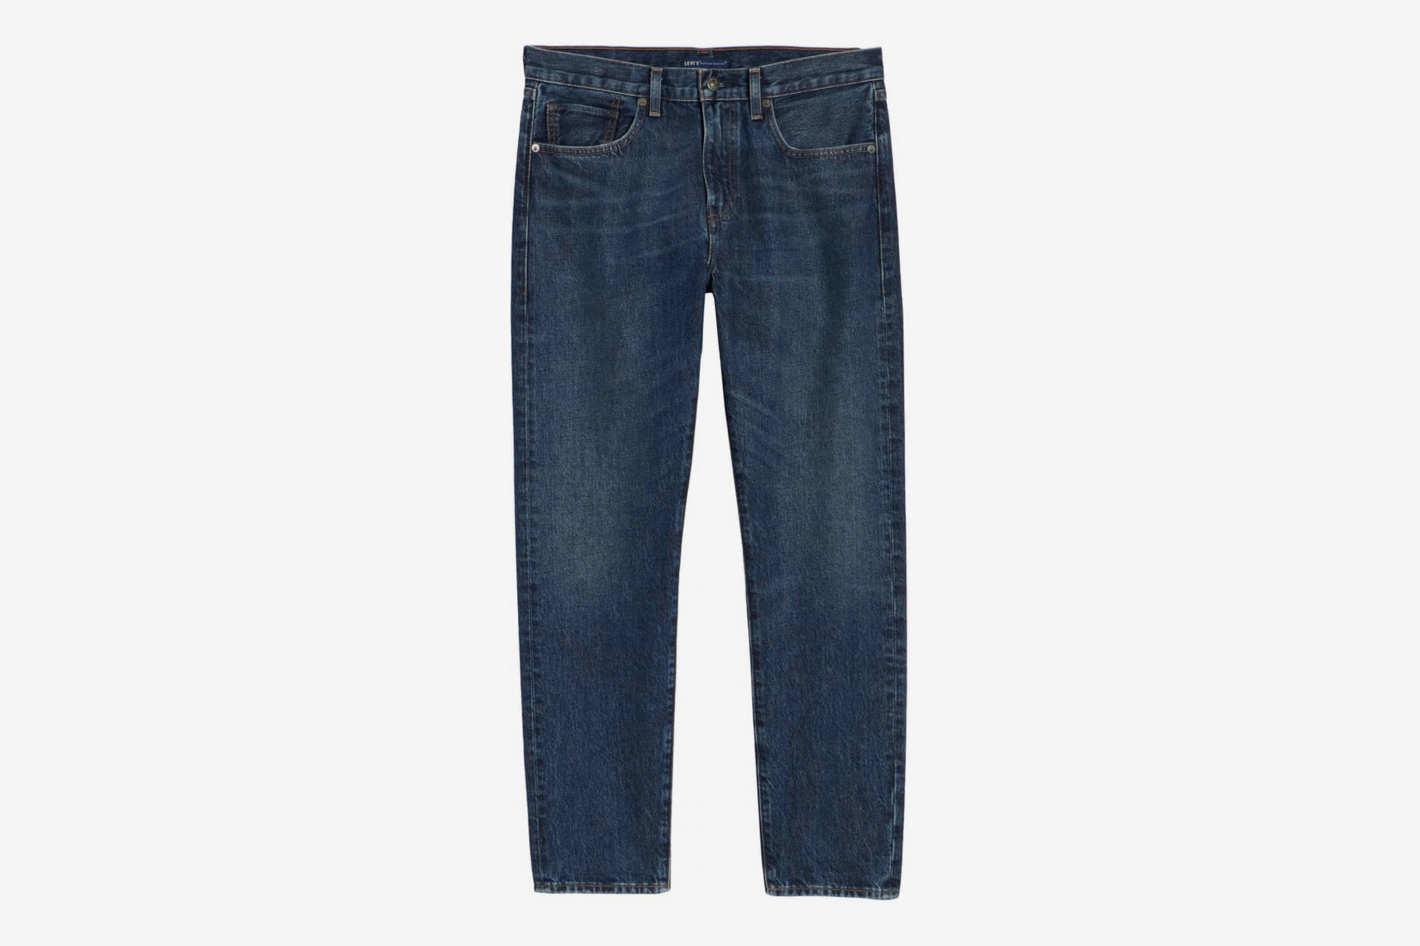 Levi's 502 Straight Leg Jeans